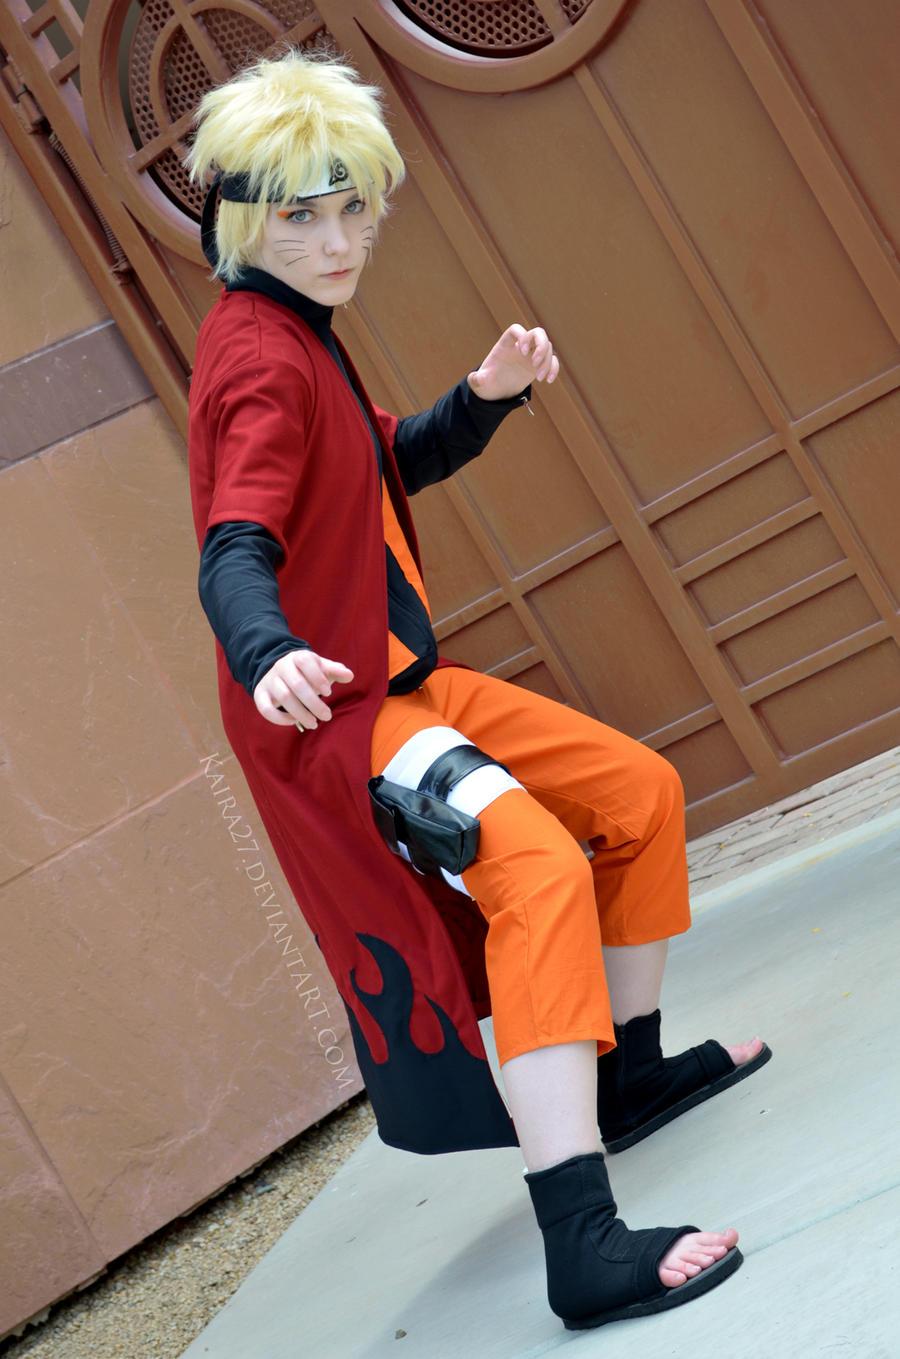 Naruto: Fighting Stance by Kaira27